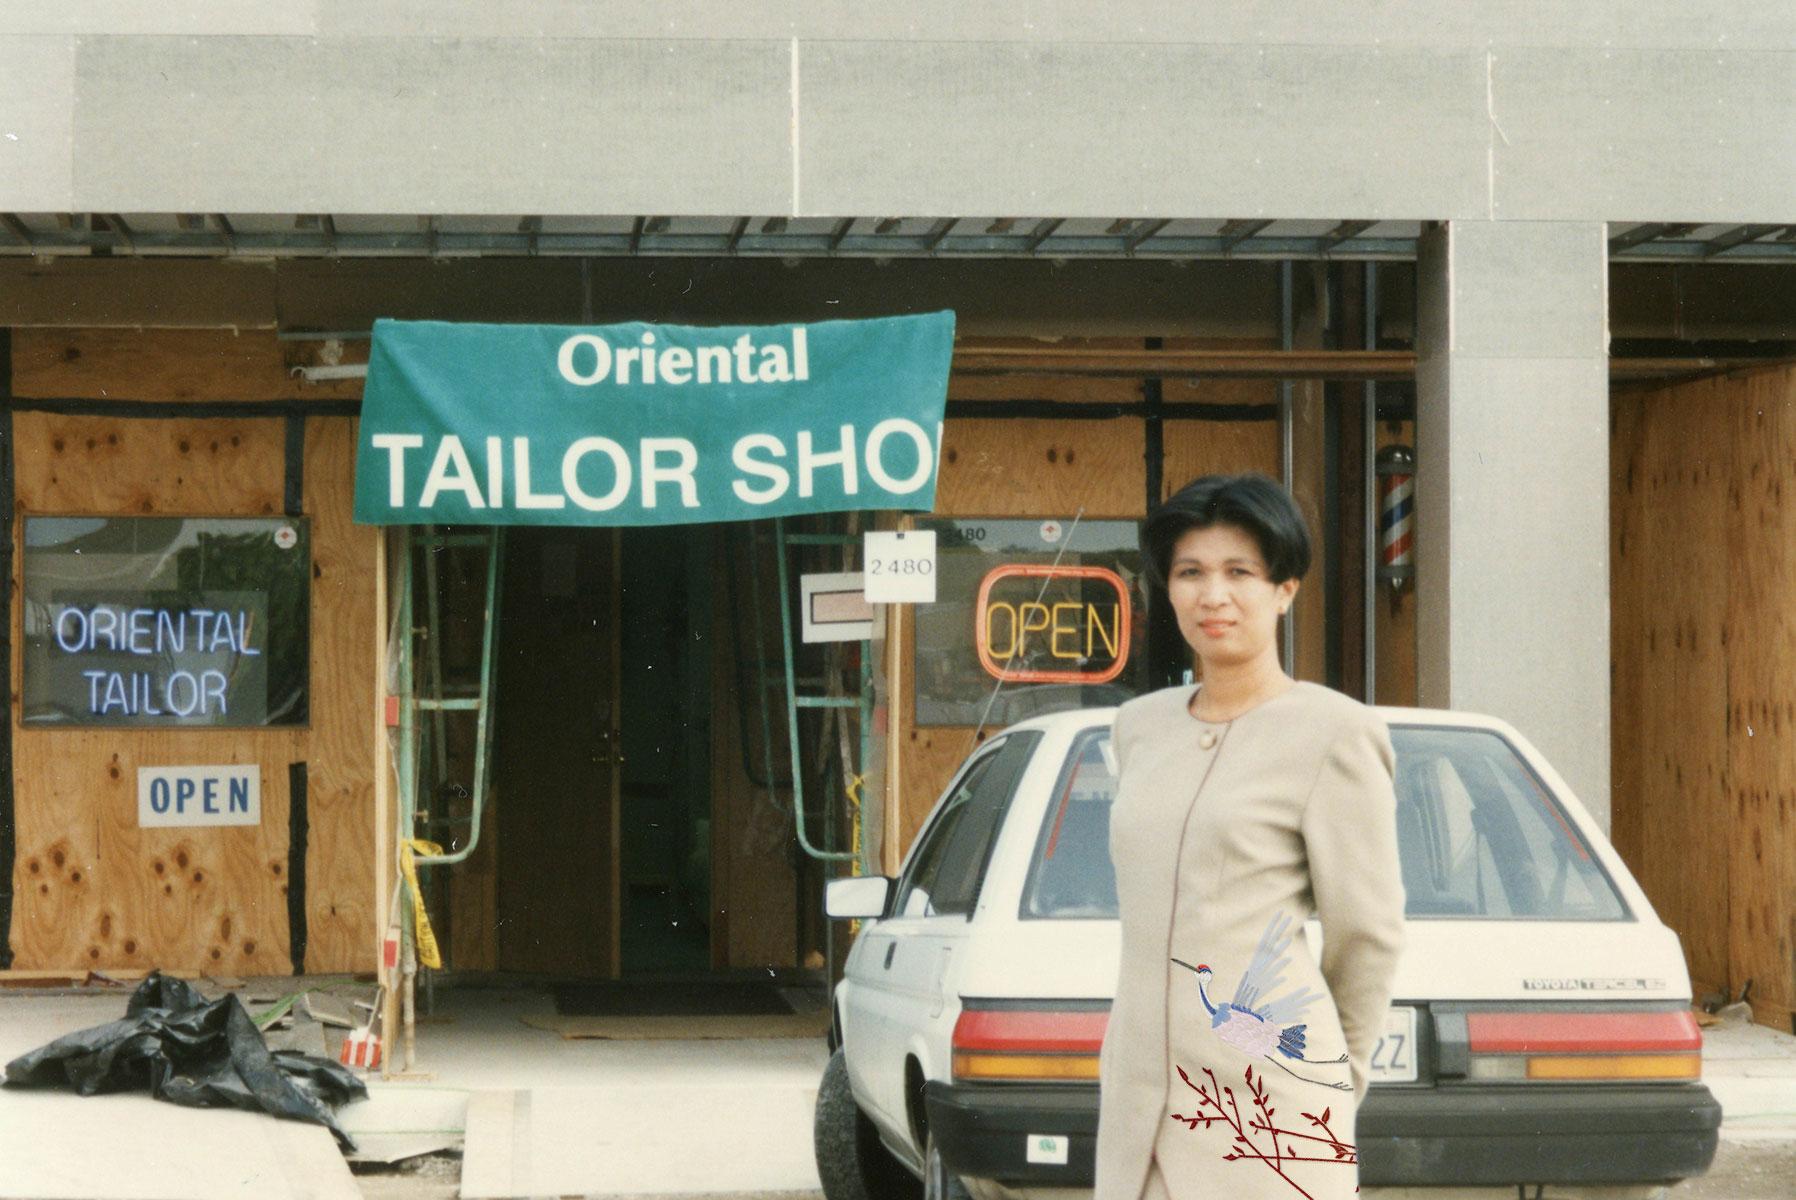 oriental-tailor-shop_embroidered-dragon_x1200_190113_nh_v1.1.1_lr.jpg